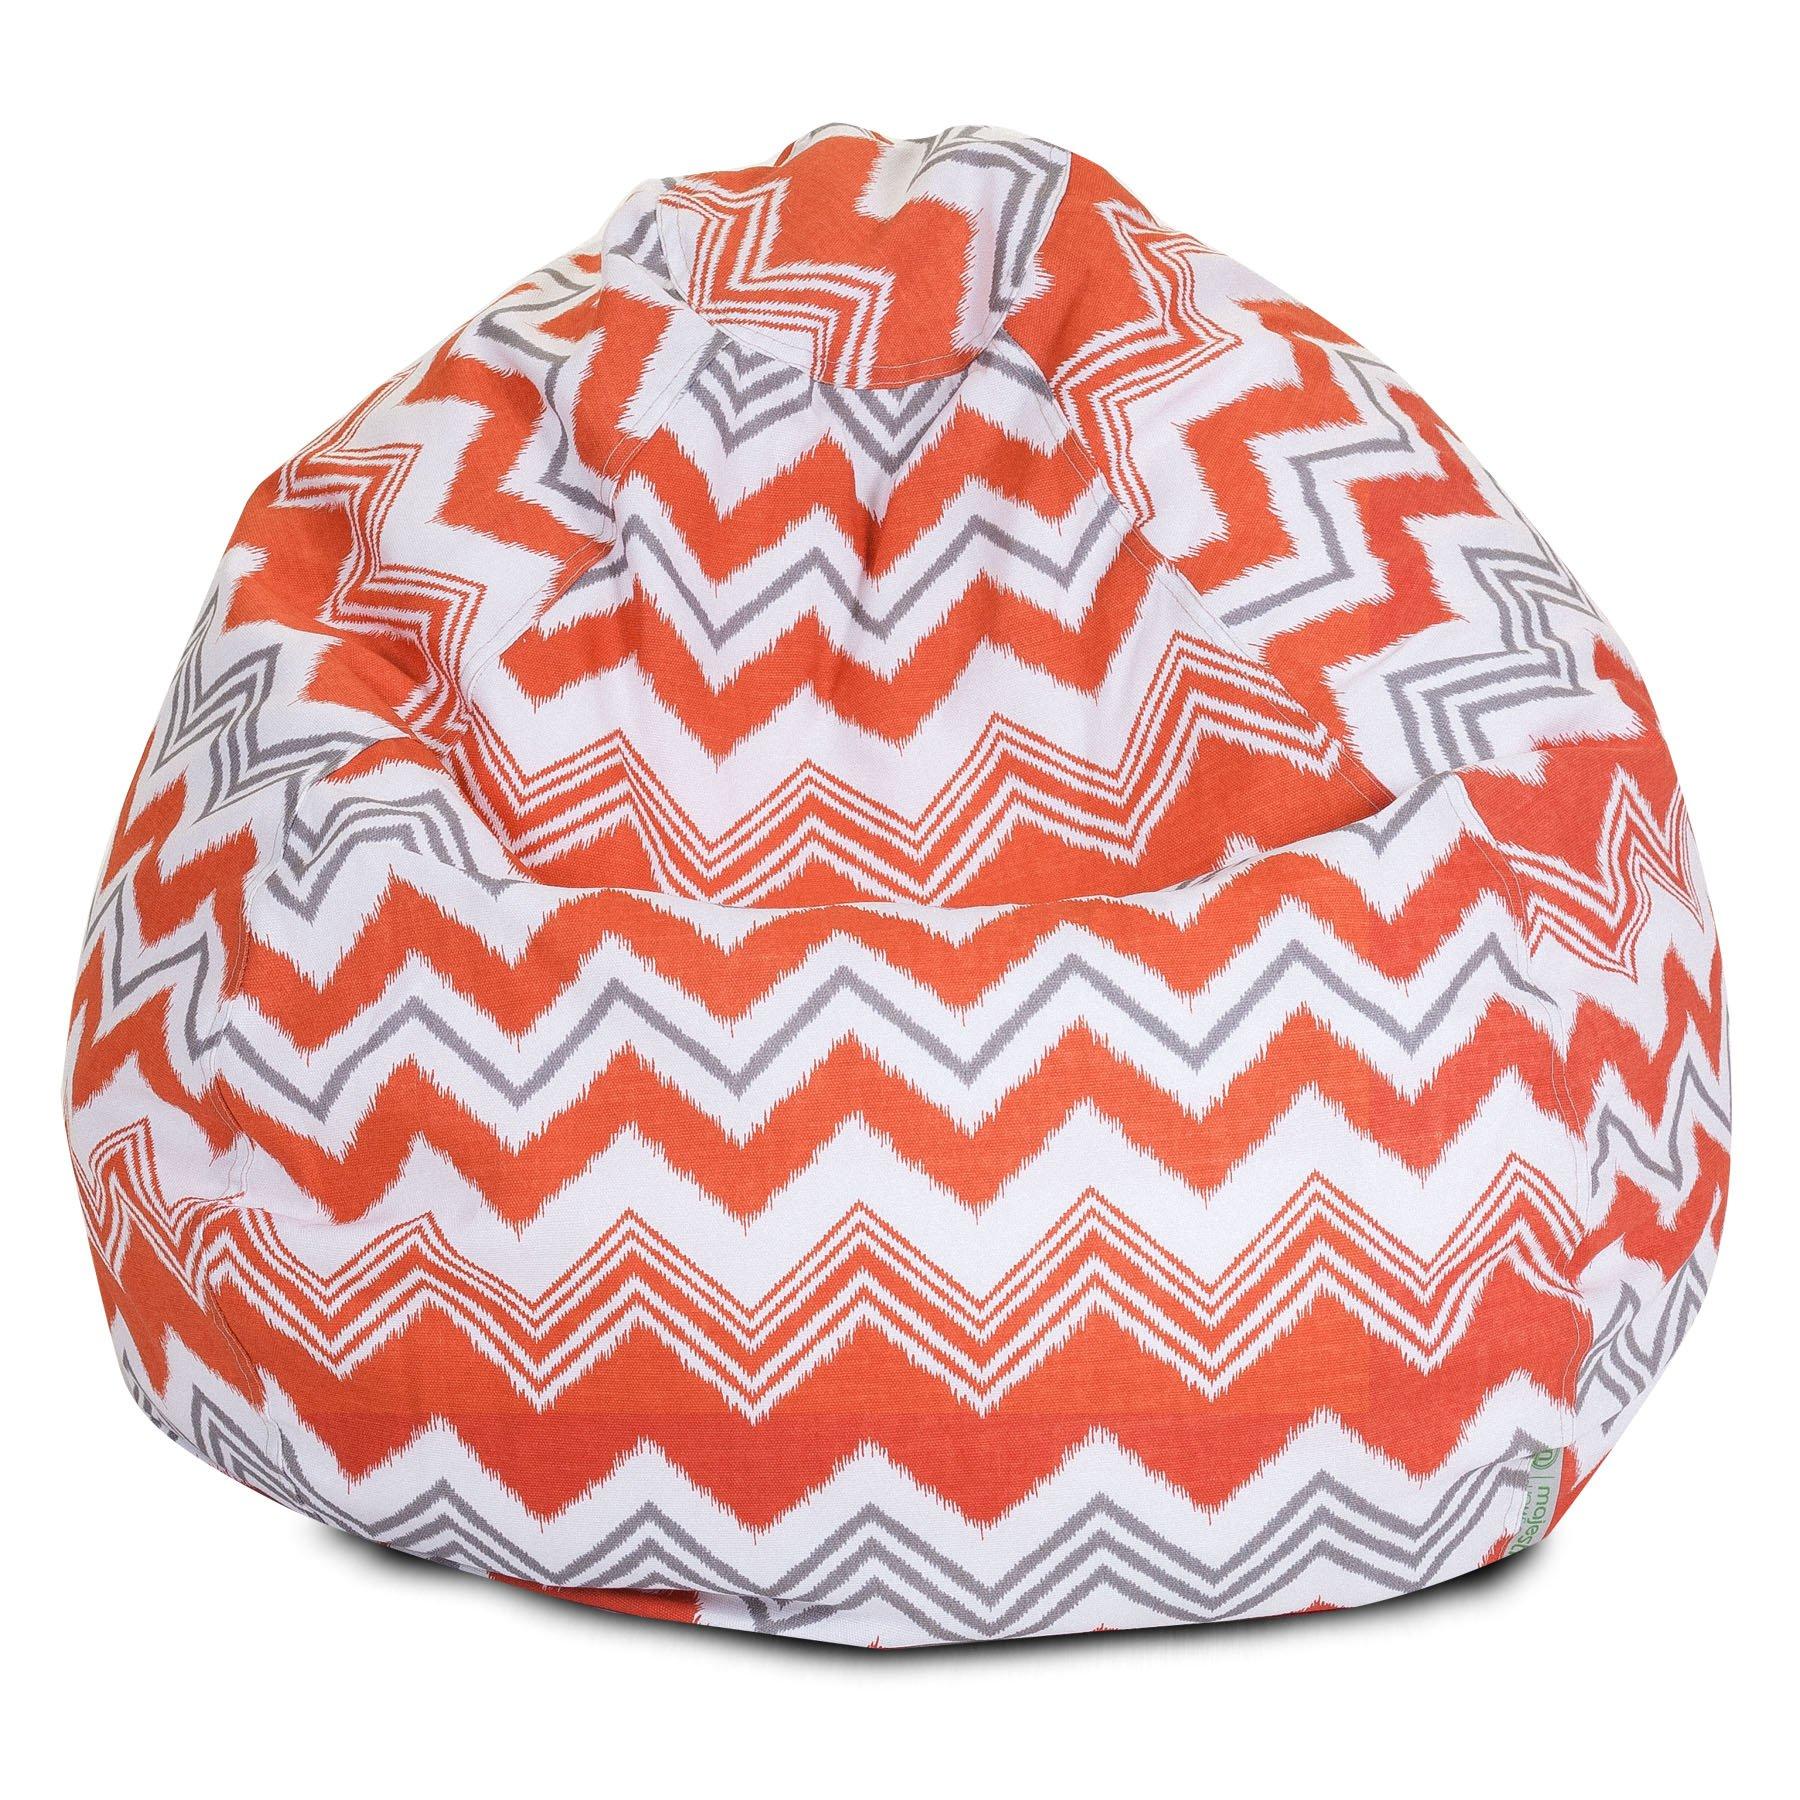 Majestic Home Goods Zazzle Bean Bag, Small, Orange